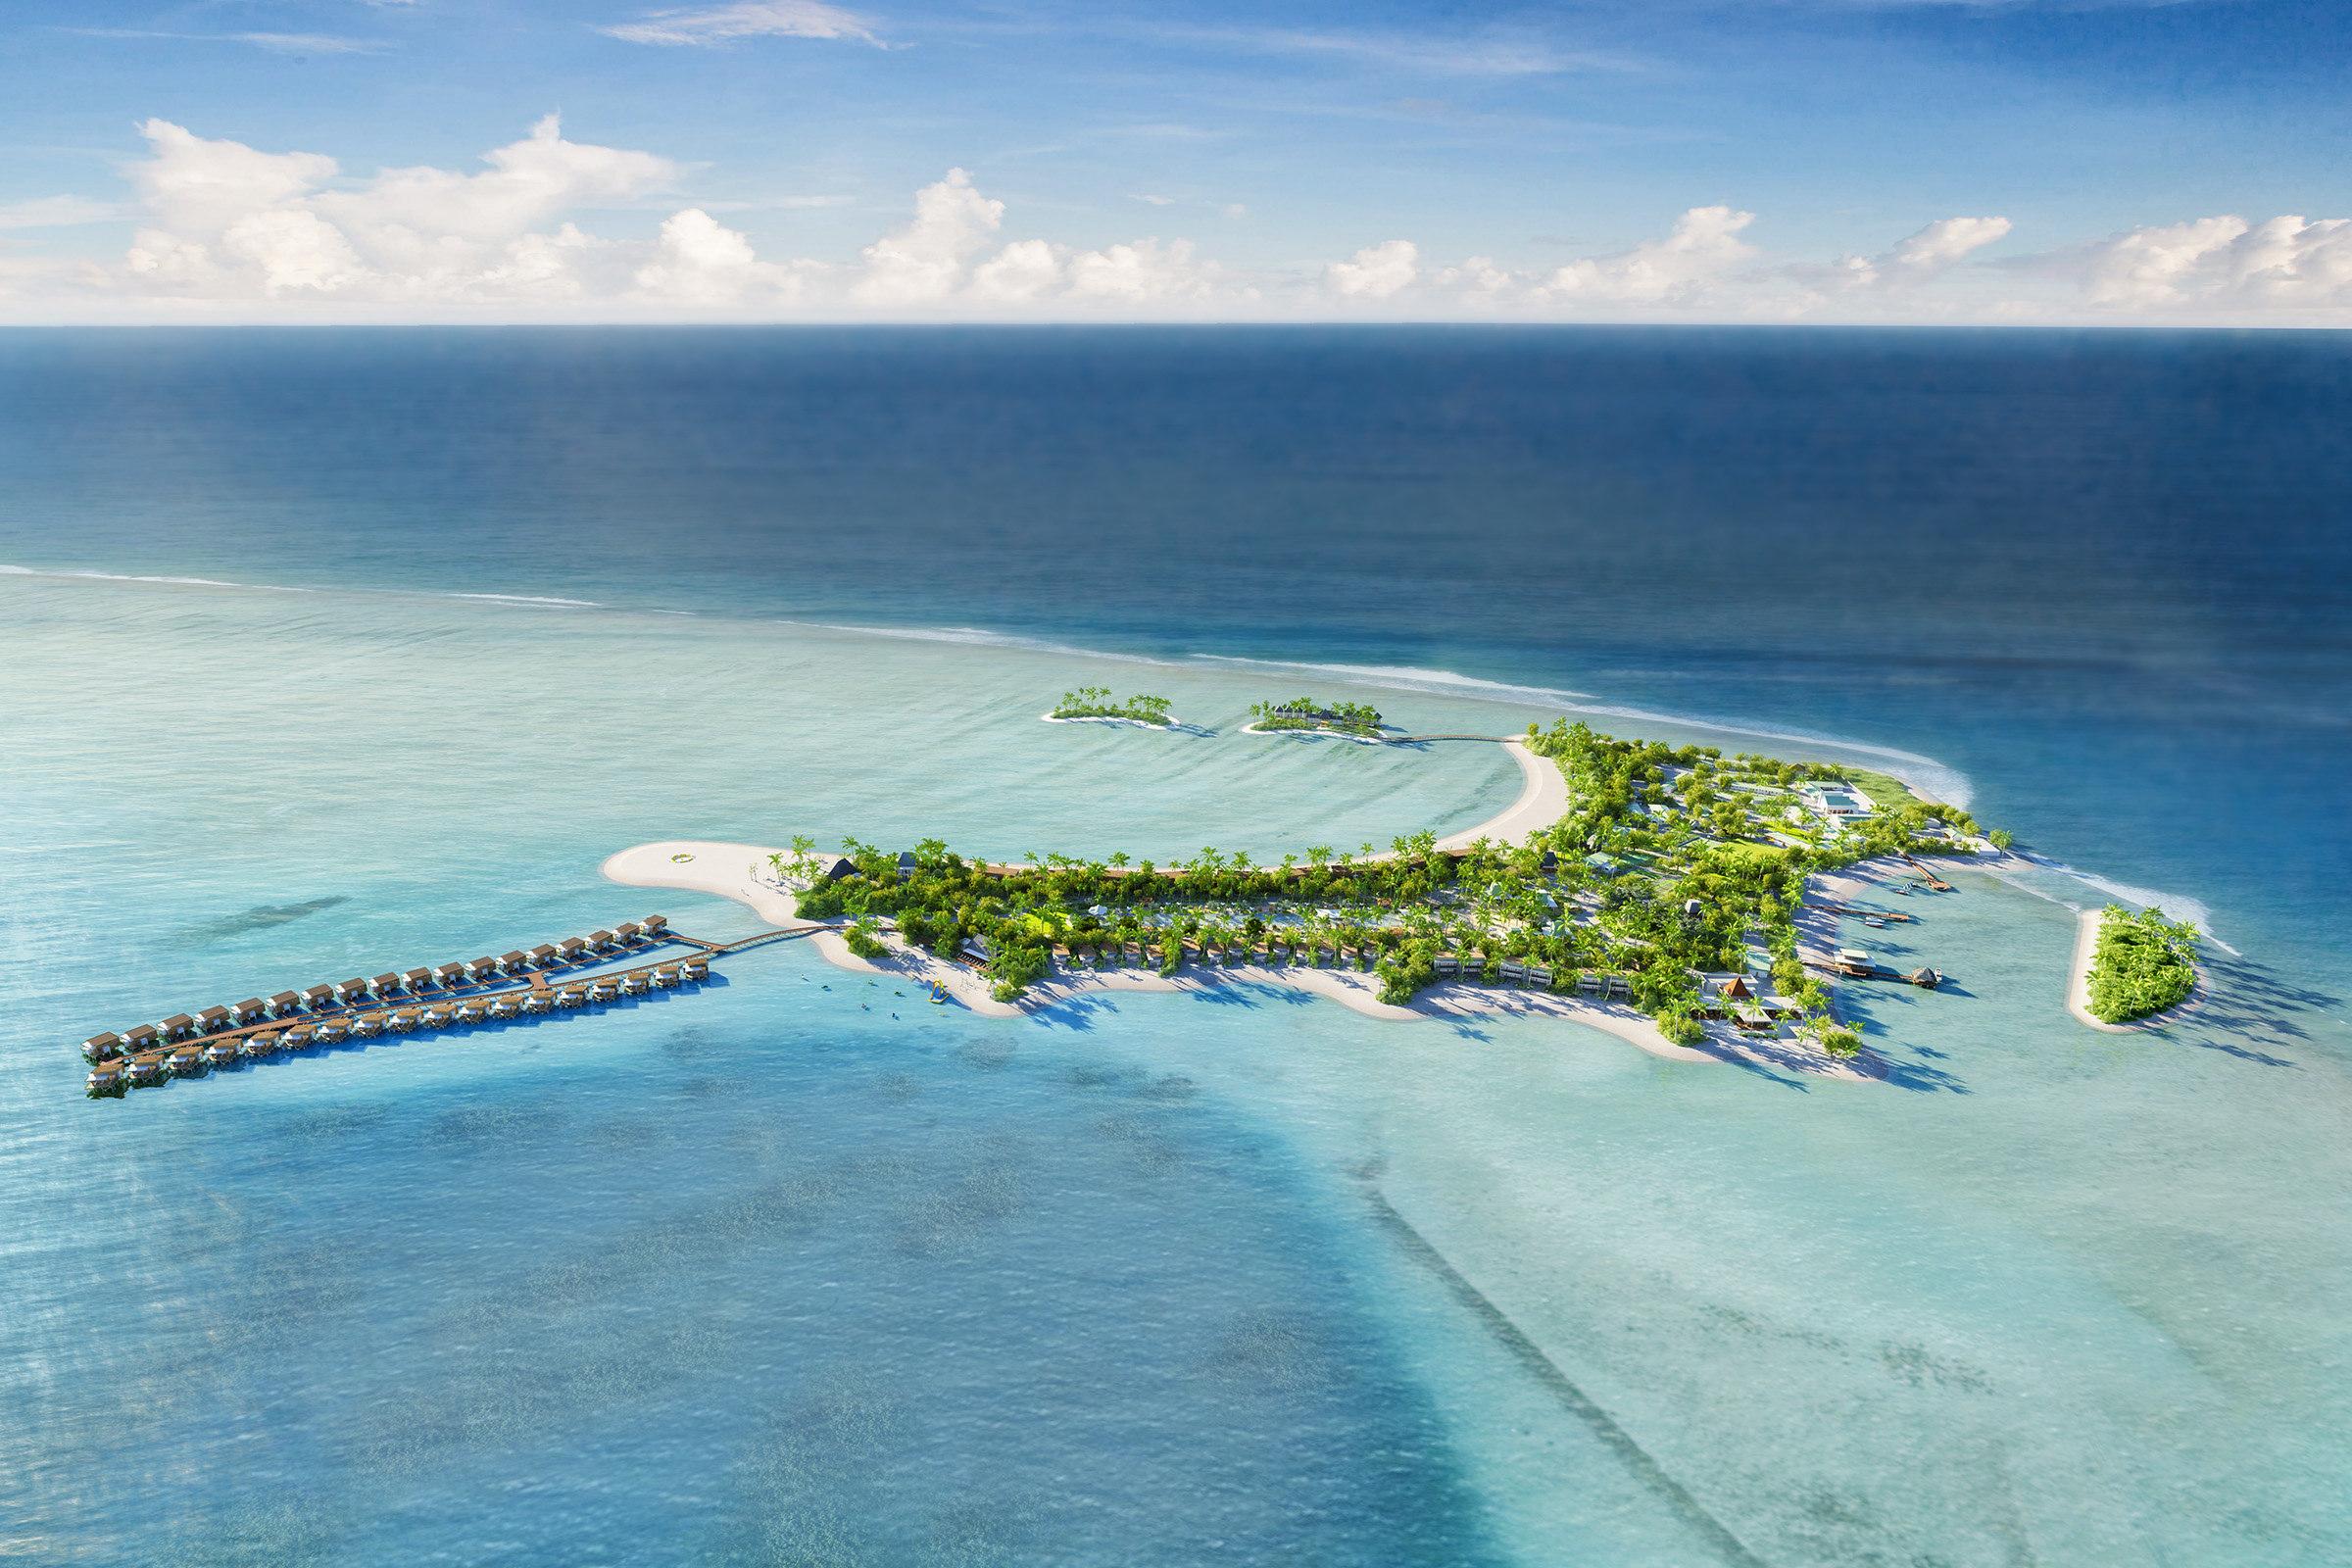 The Chedi KV, Maldives